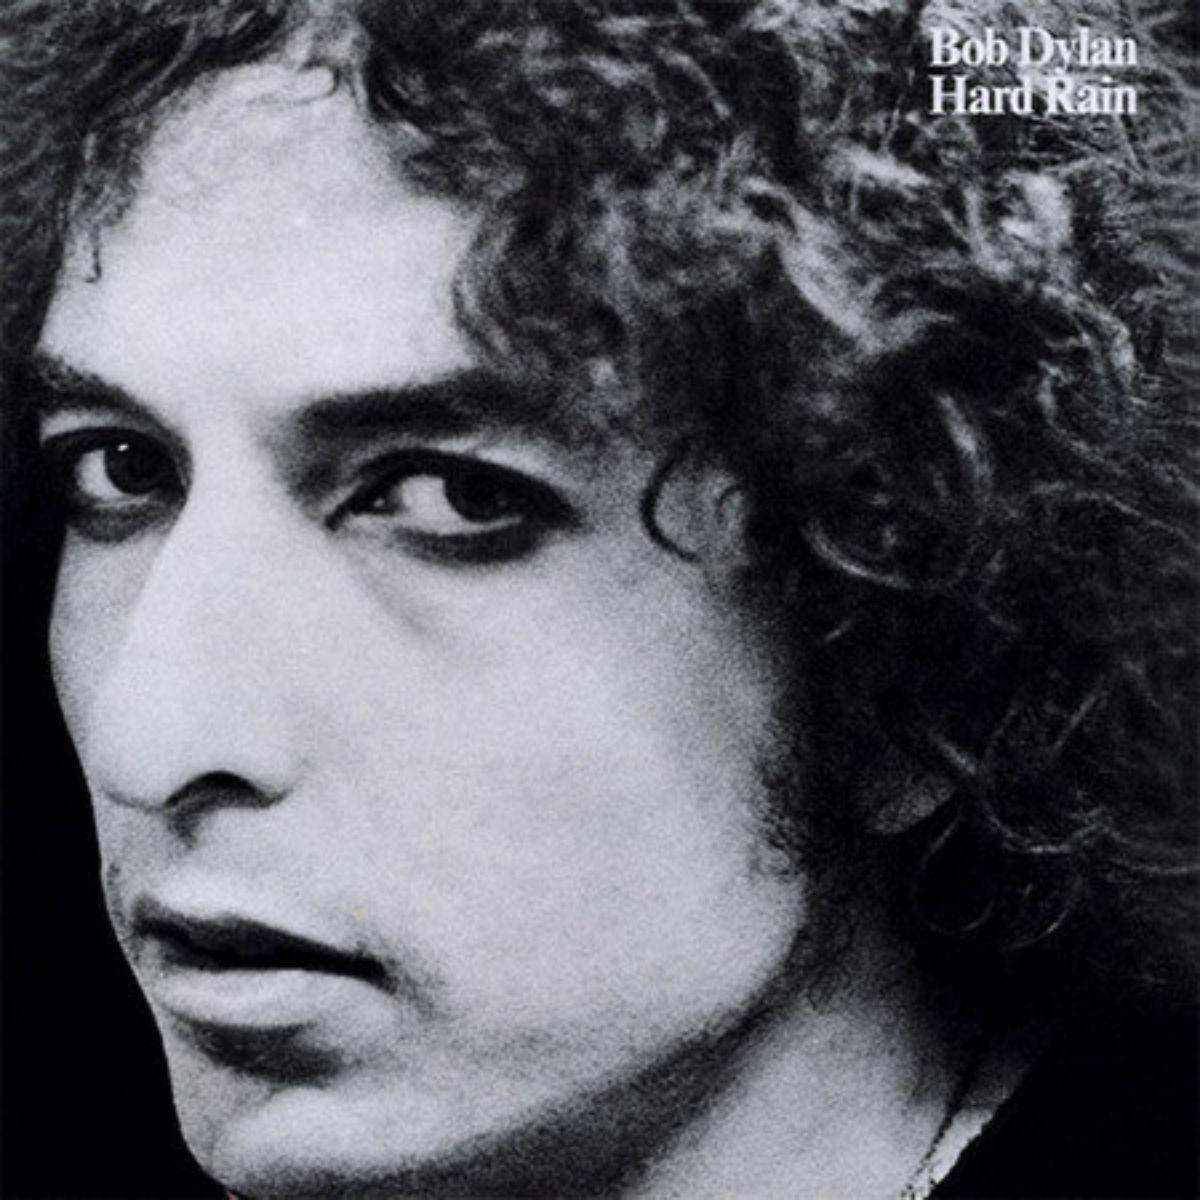 Lp Bob Dylan Hard Rain Novo Lacrado